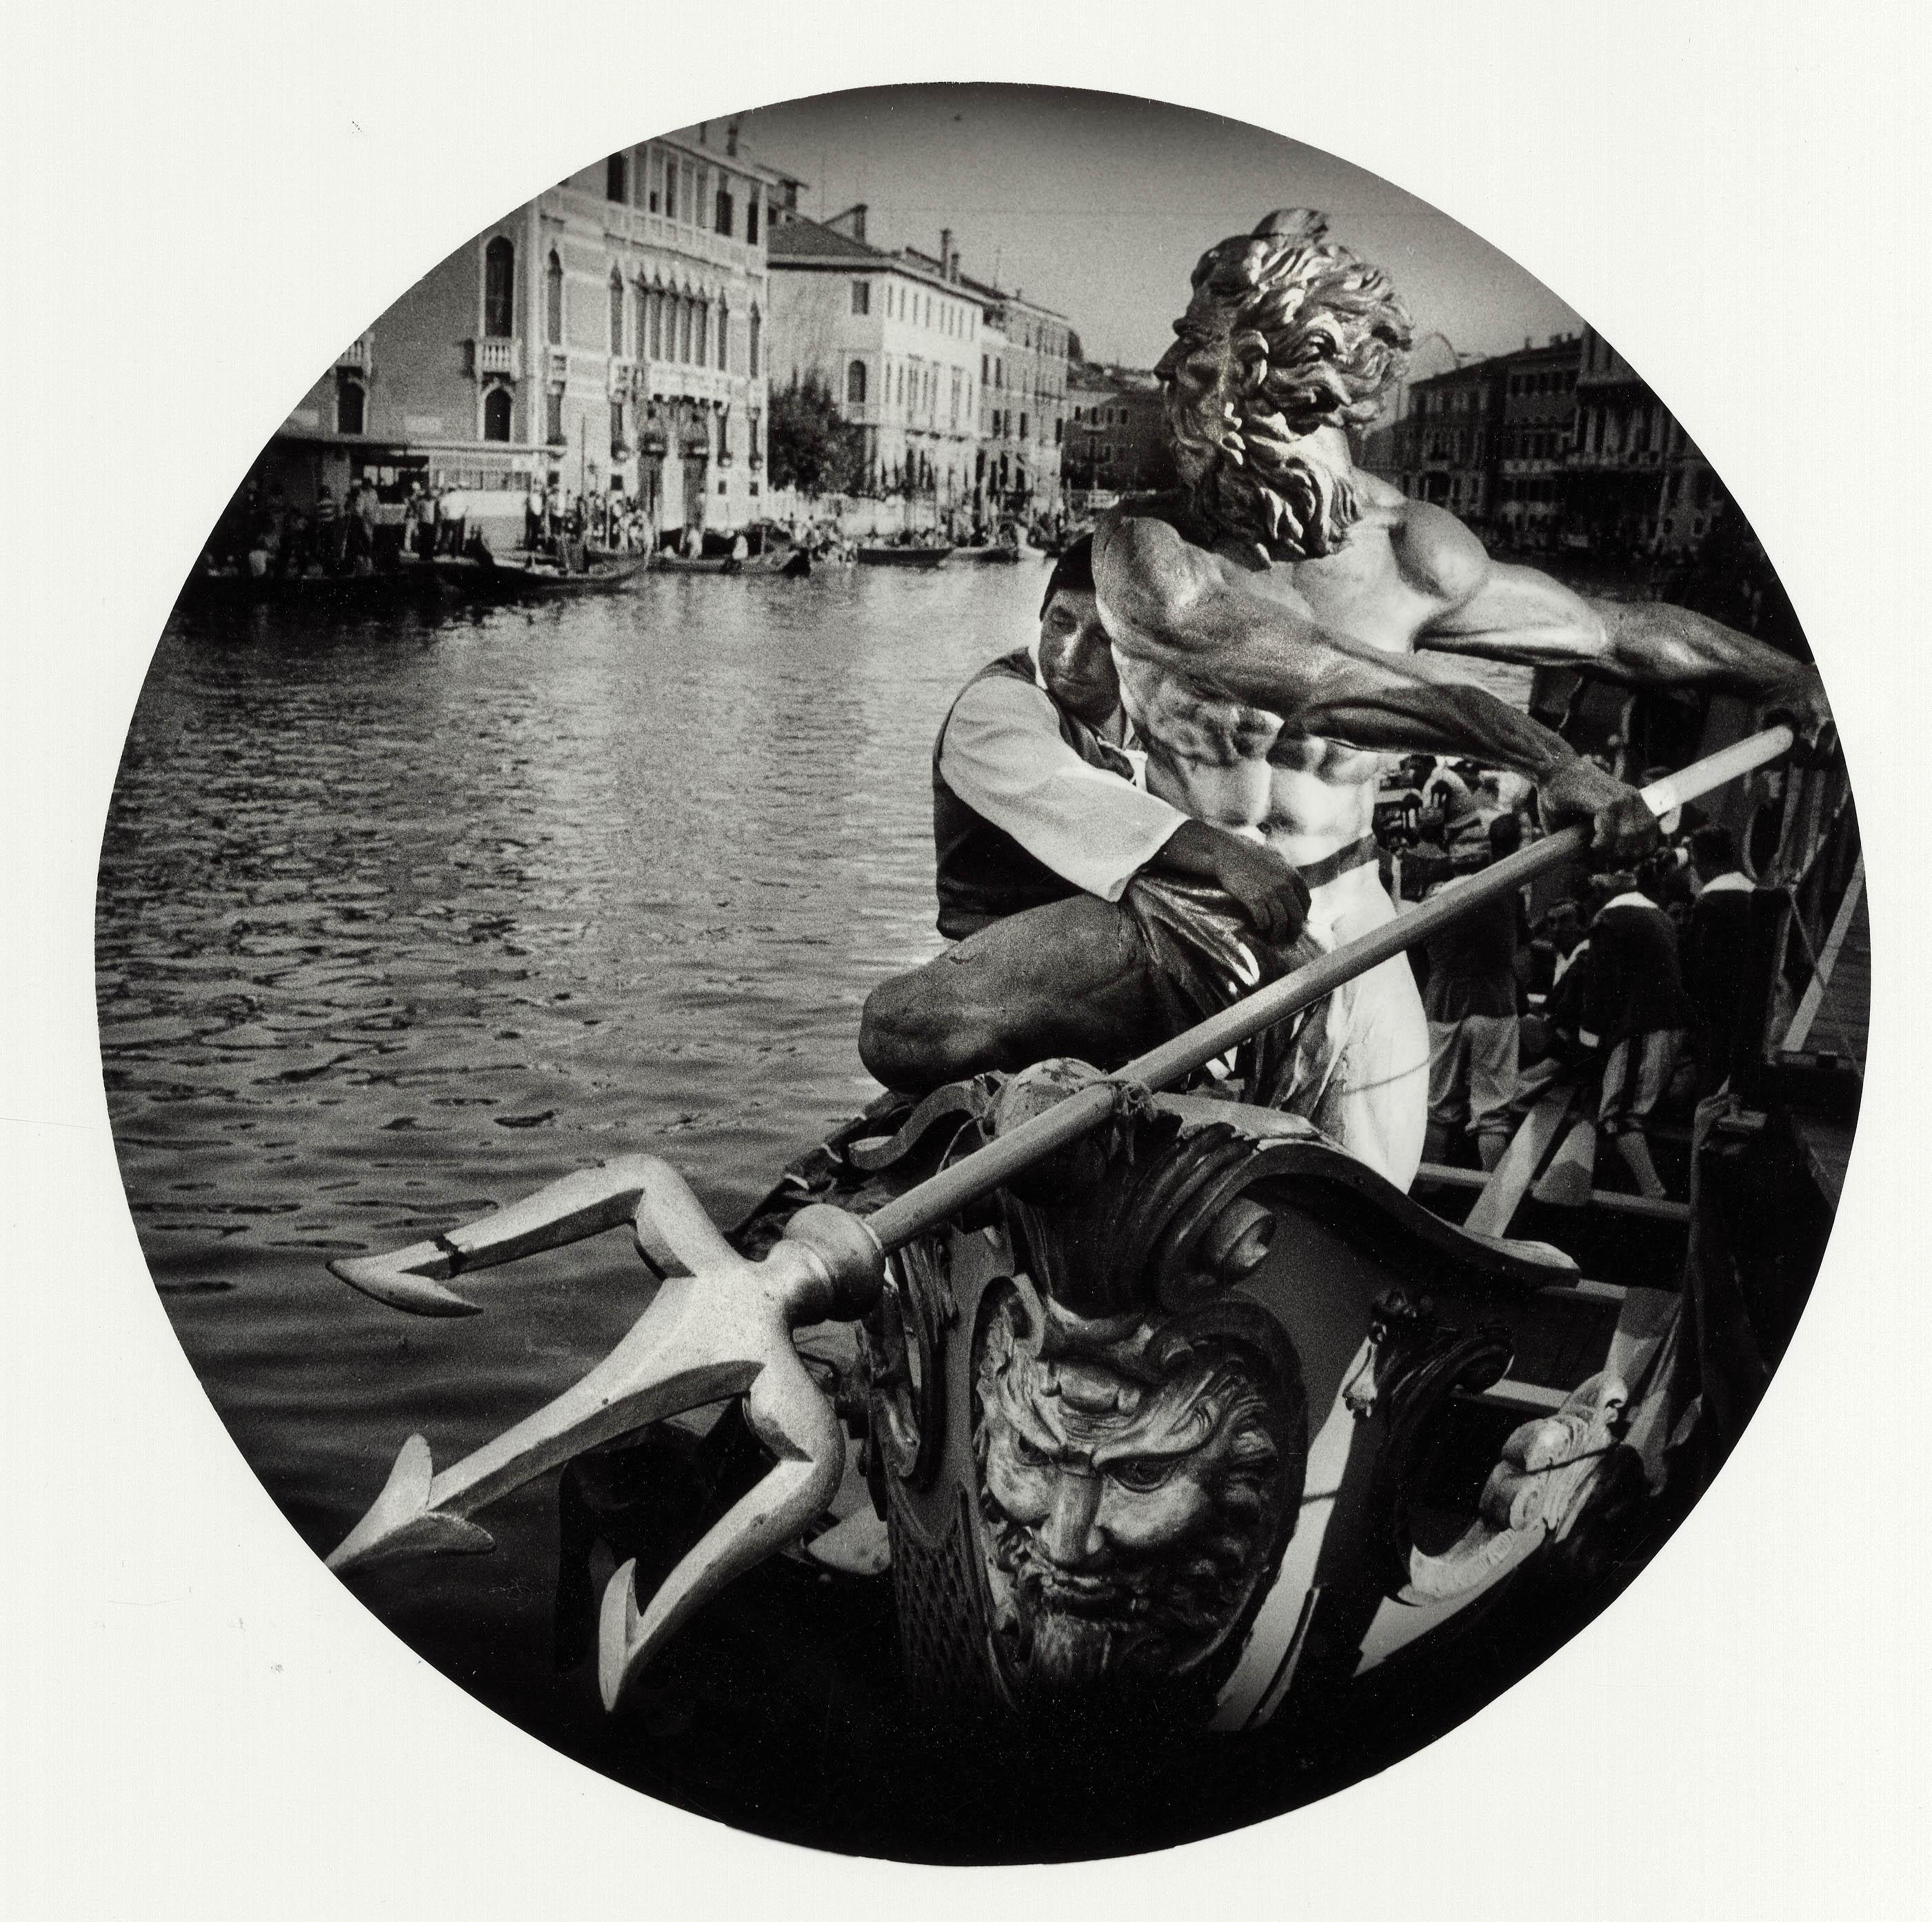 Roberto Salbitani, Venezia, 1972 - 1982